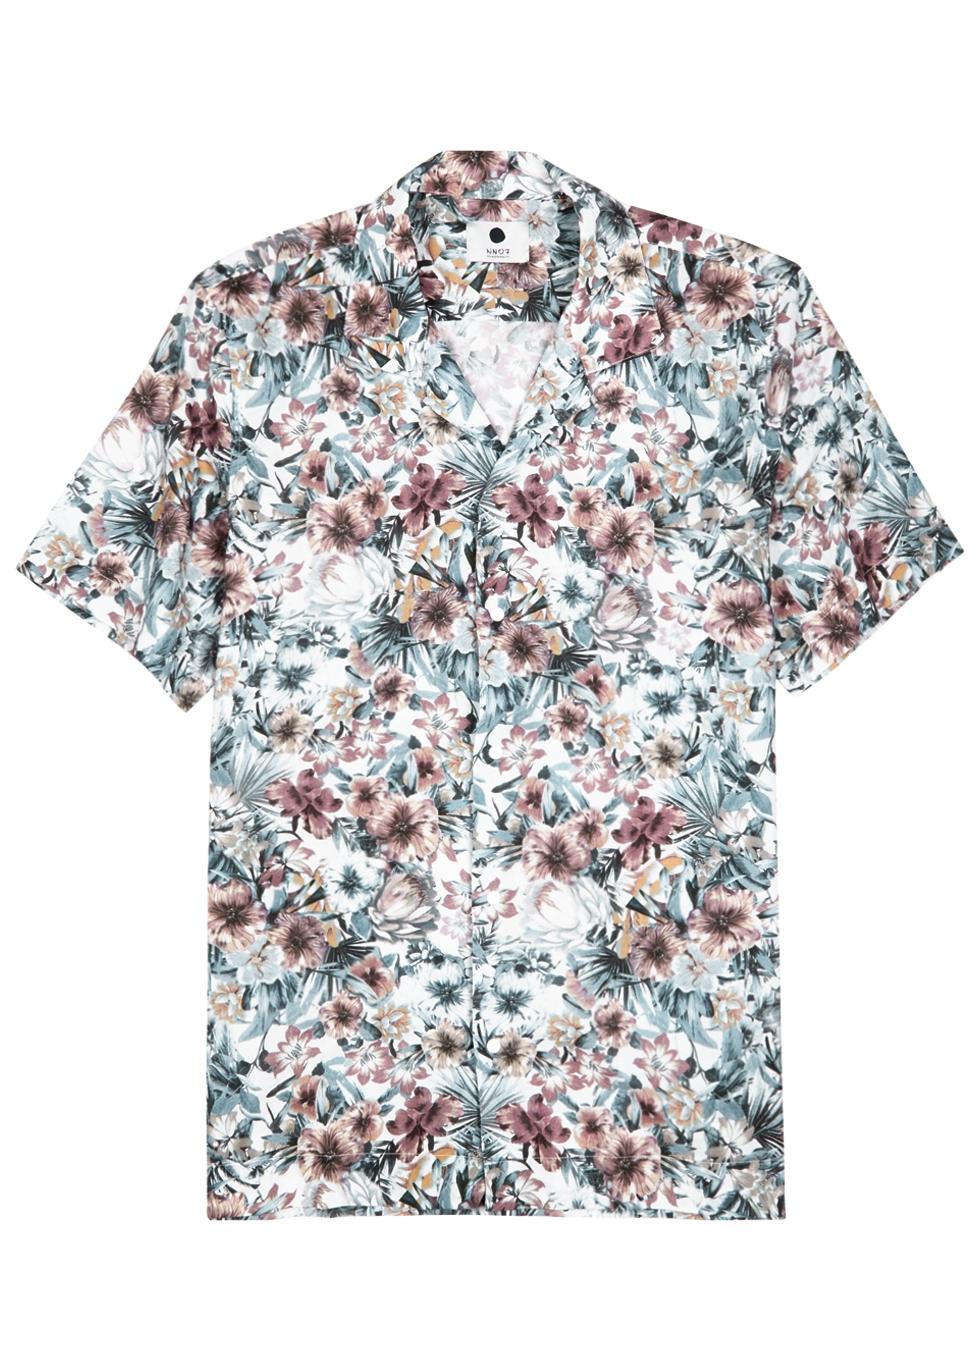 NN07 Miyagi Camp-Collar Printed Cotton Shirt - Gray in Multicoloured